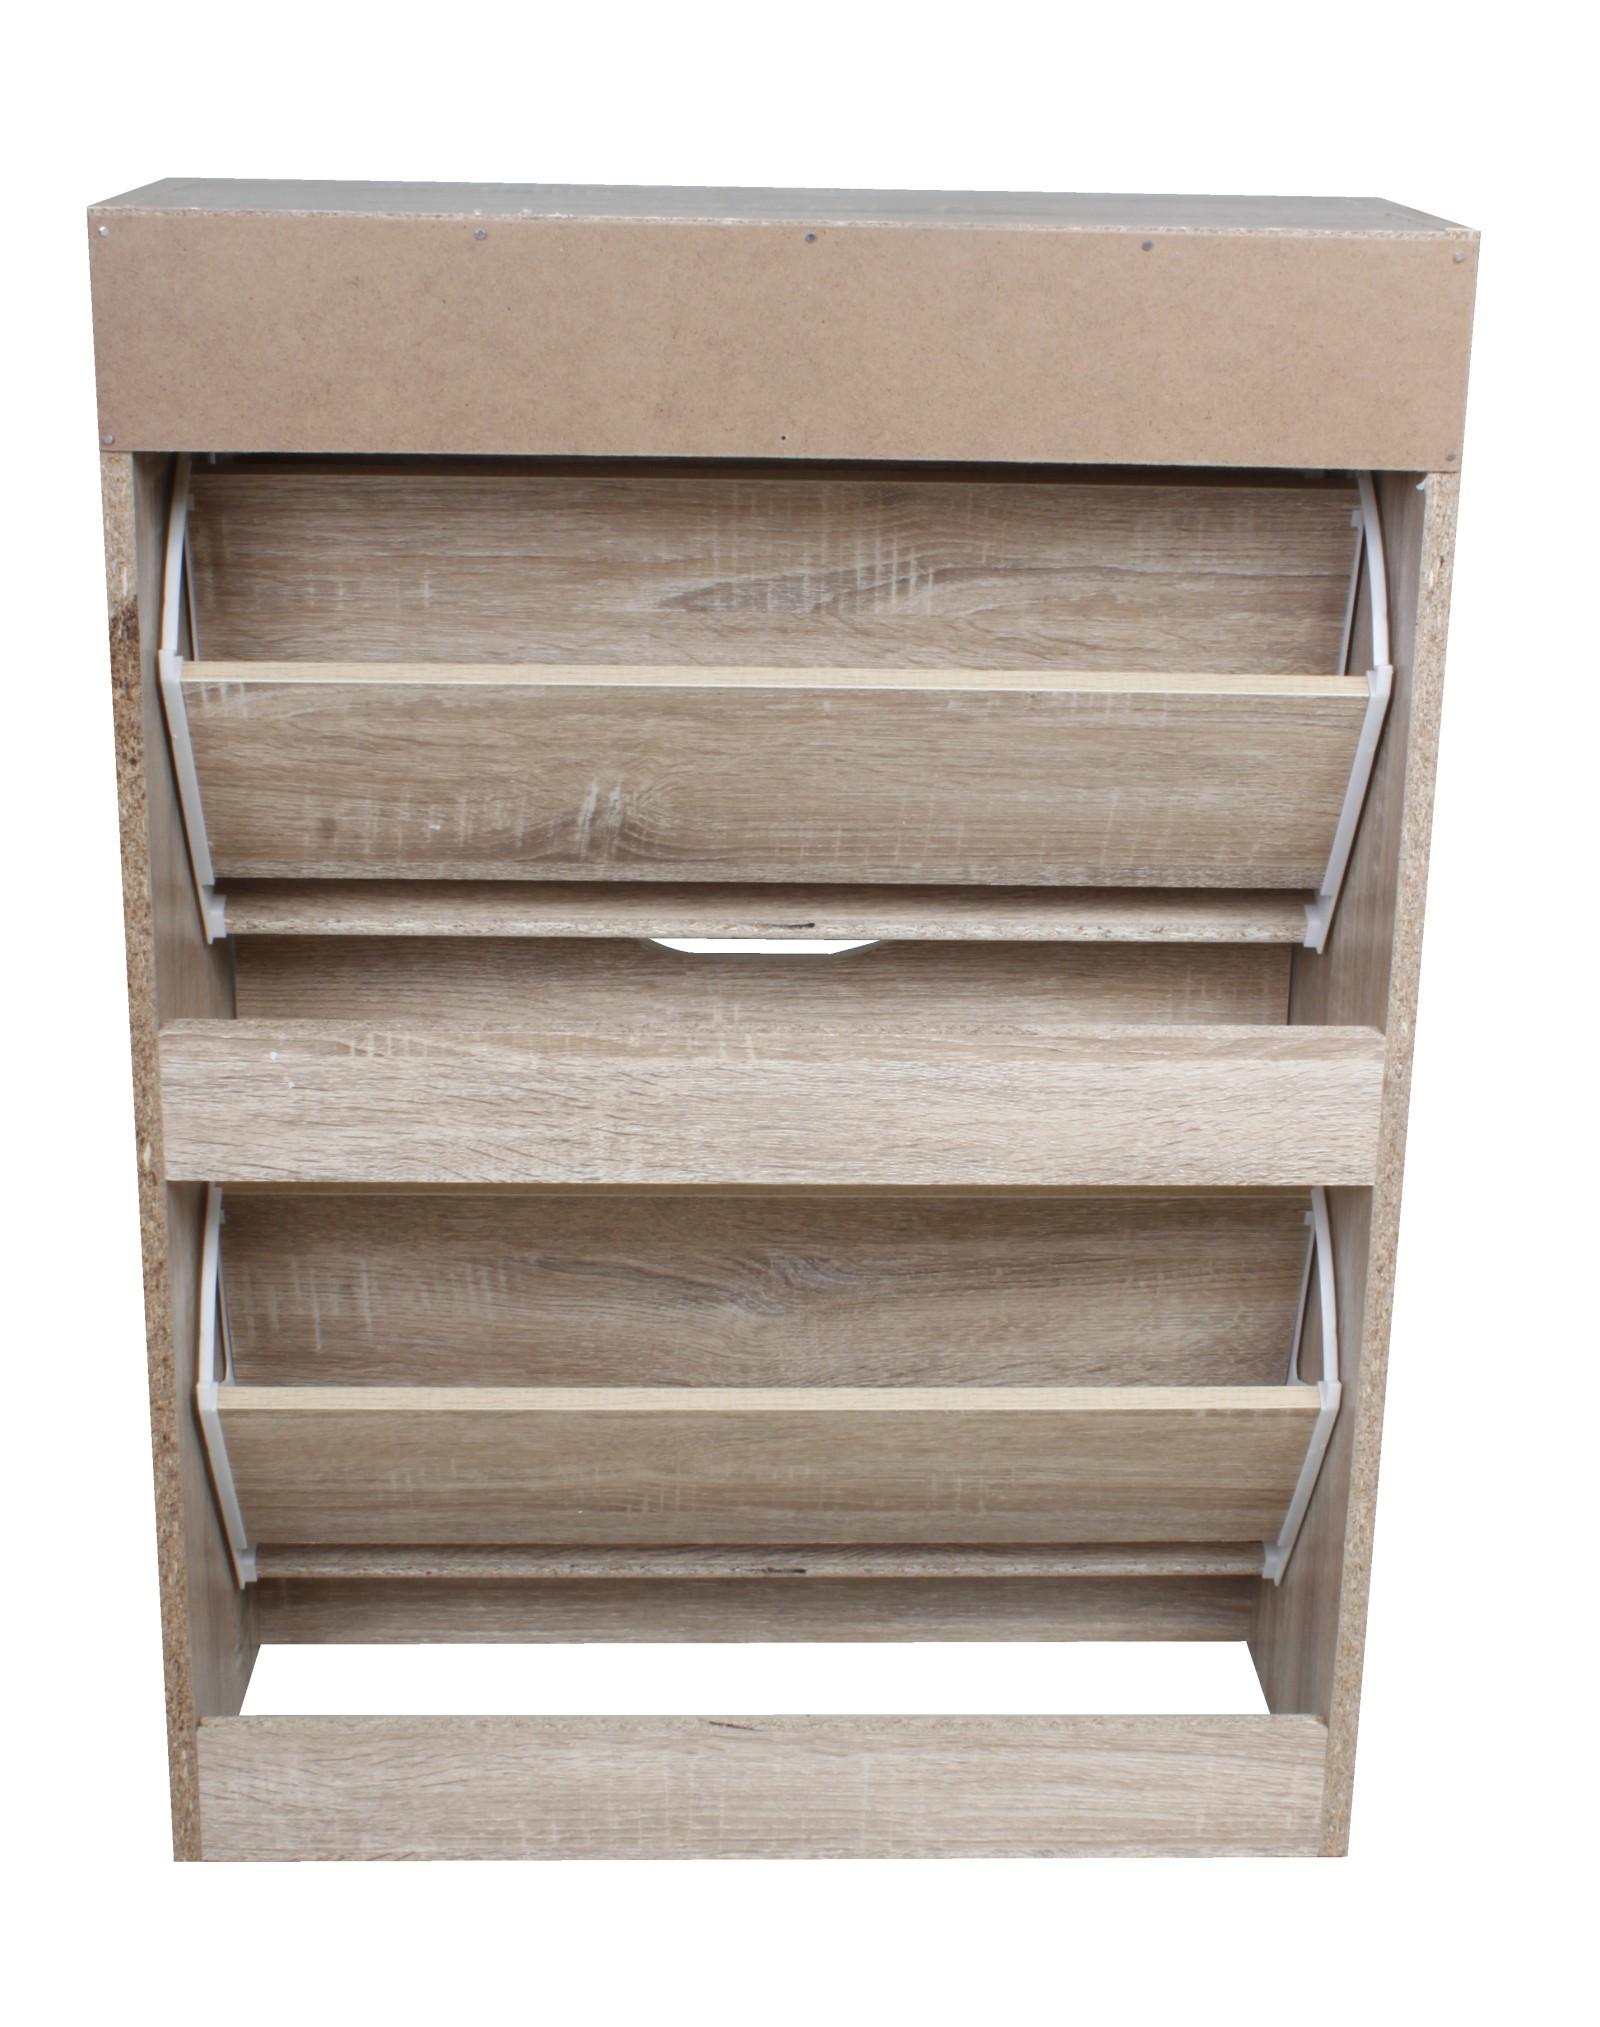 Beco mueble para calzado armario de zapatos entarimados for Mueble zapatero ebay